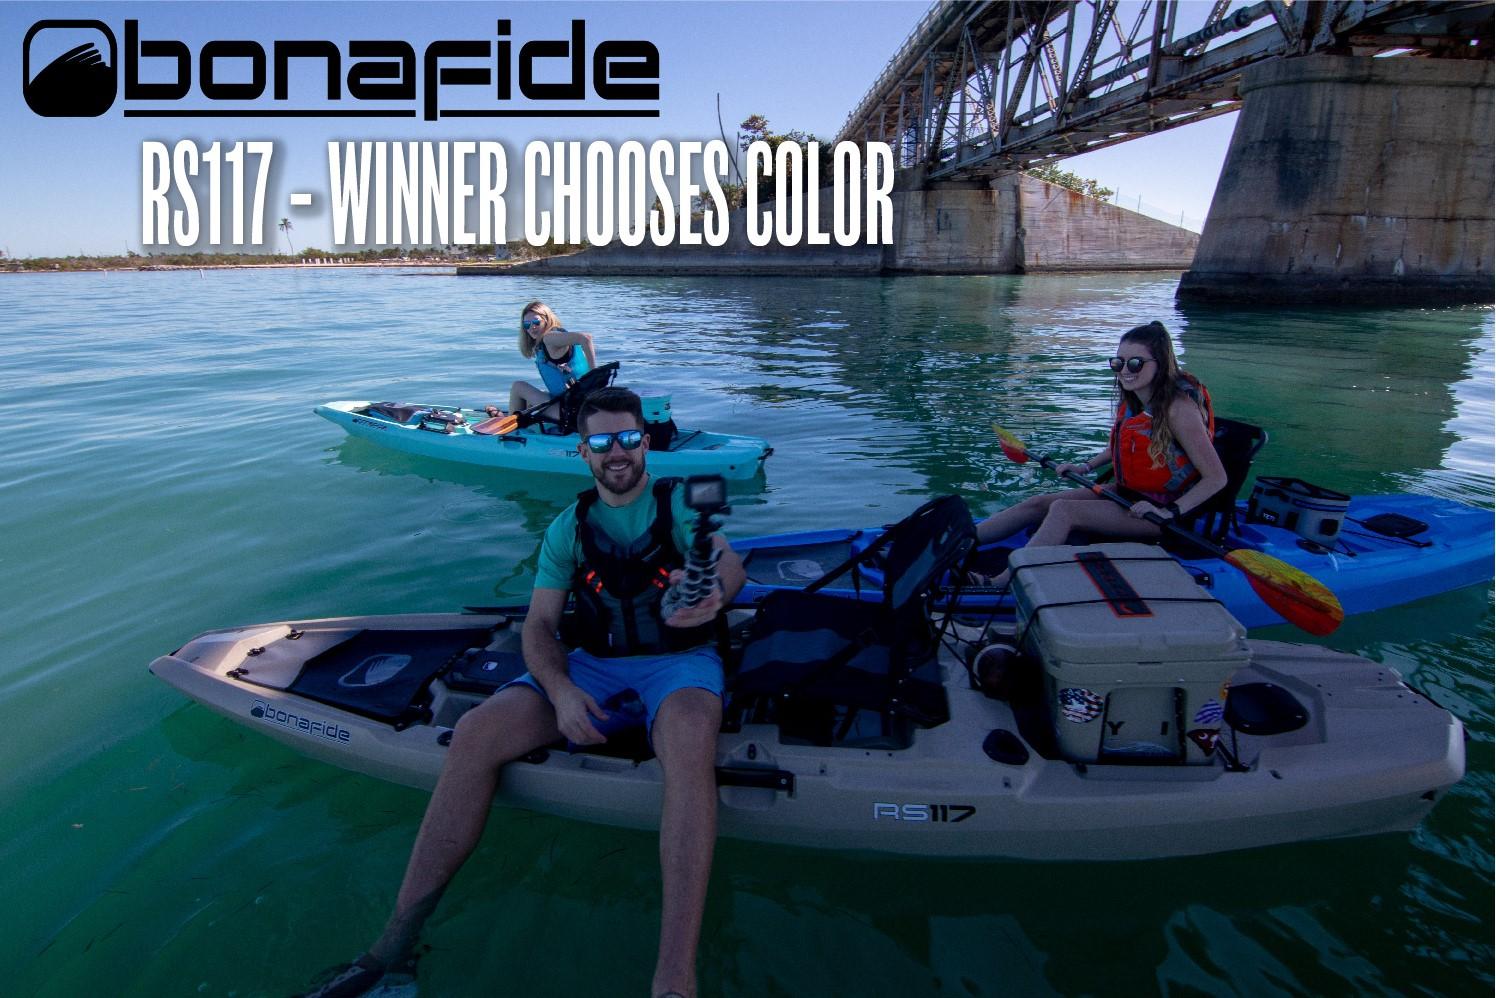 YakAttack 40K Giveaway Bonafide Kayaks